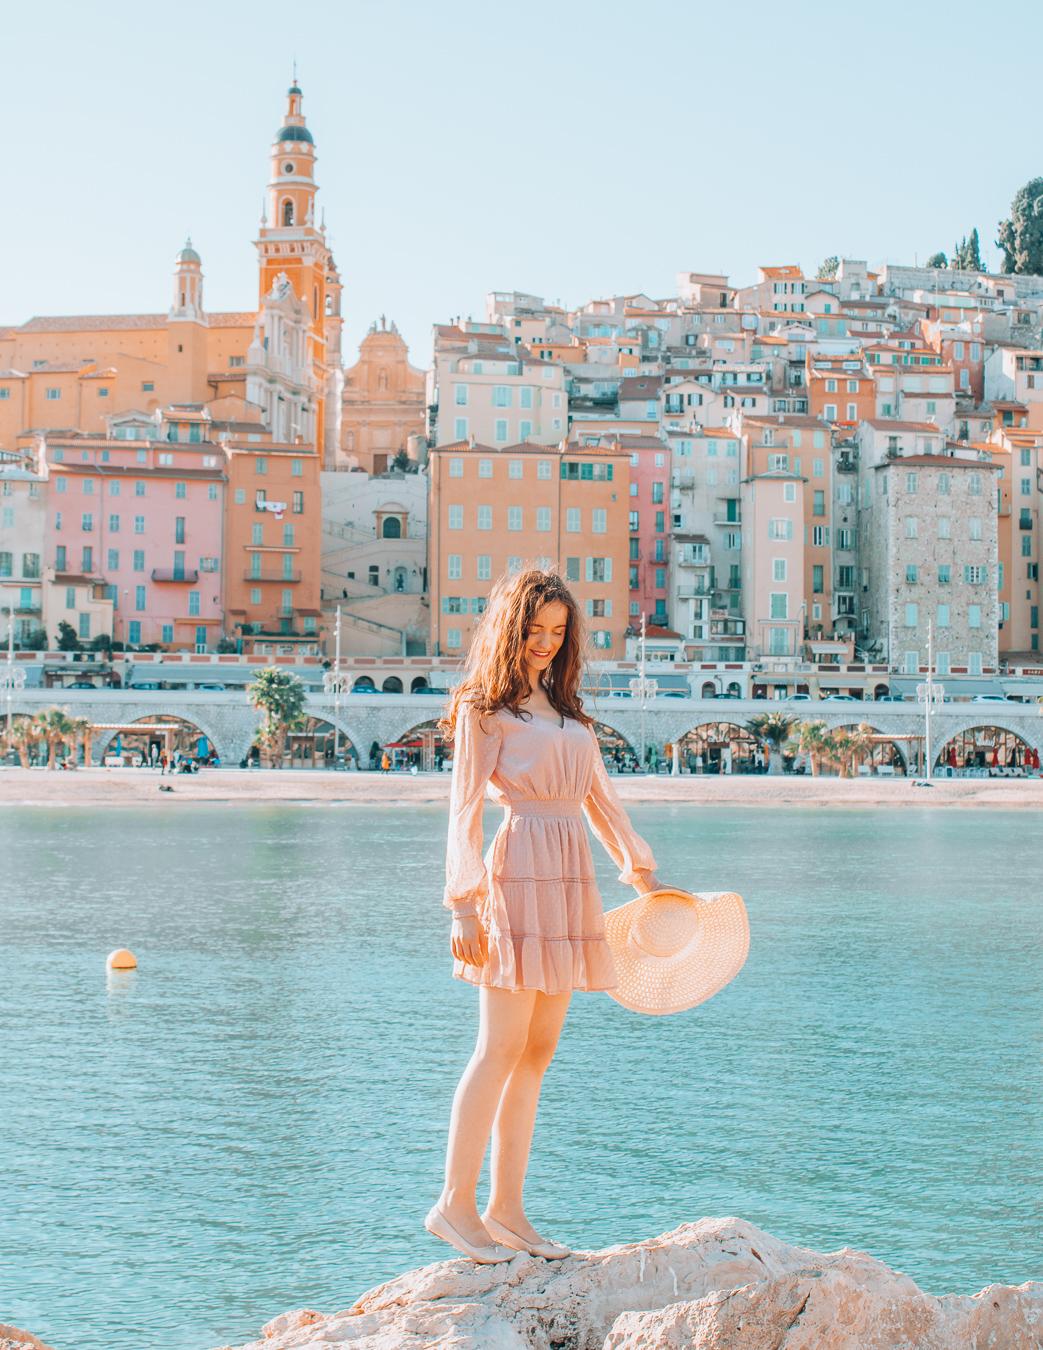 Girl standing on the rocks in Menton